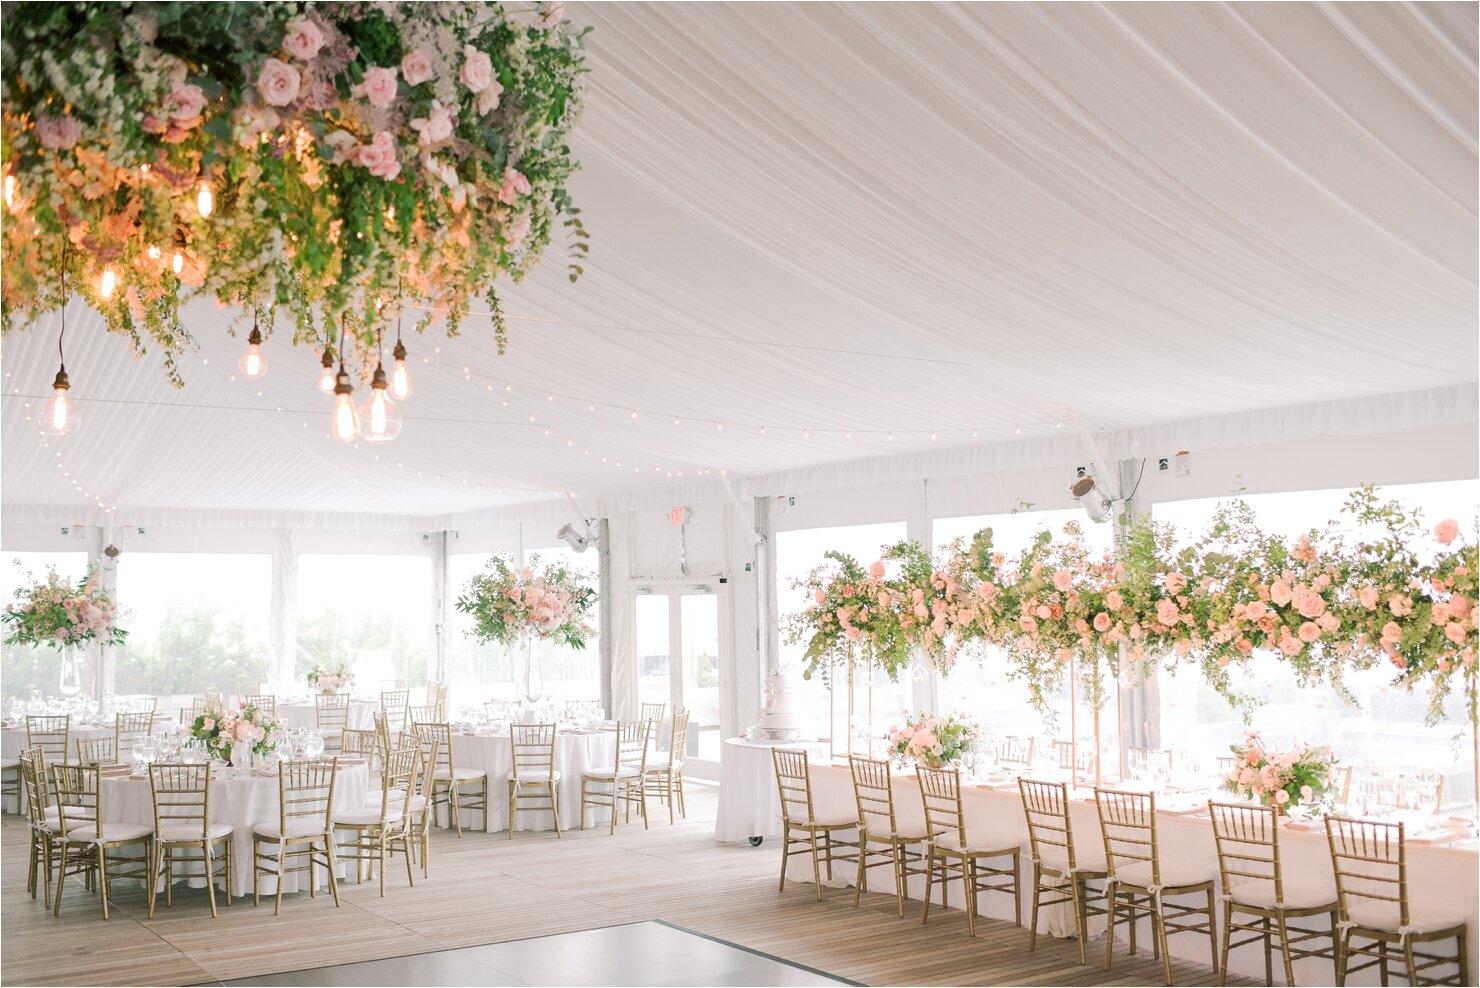 Tented Wedding Reception at Gurney's Montauk